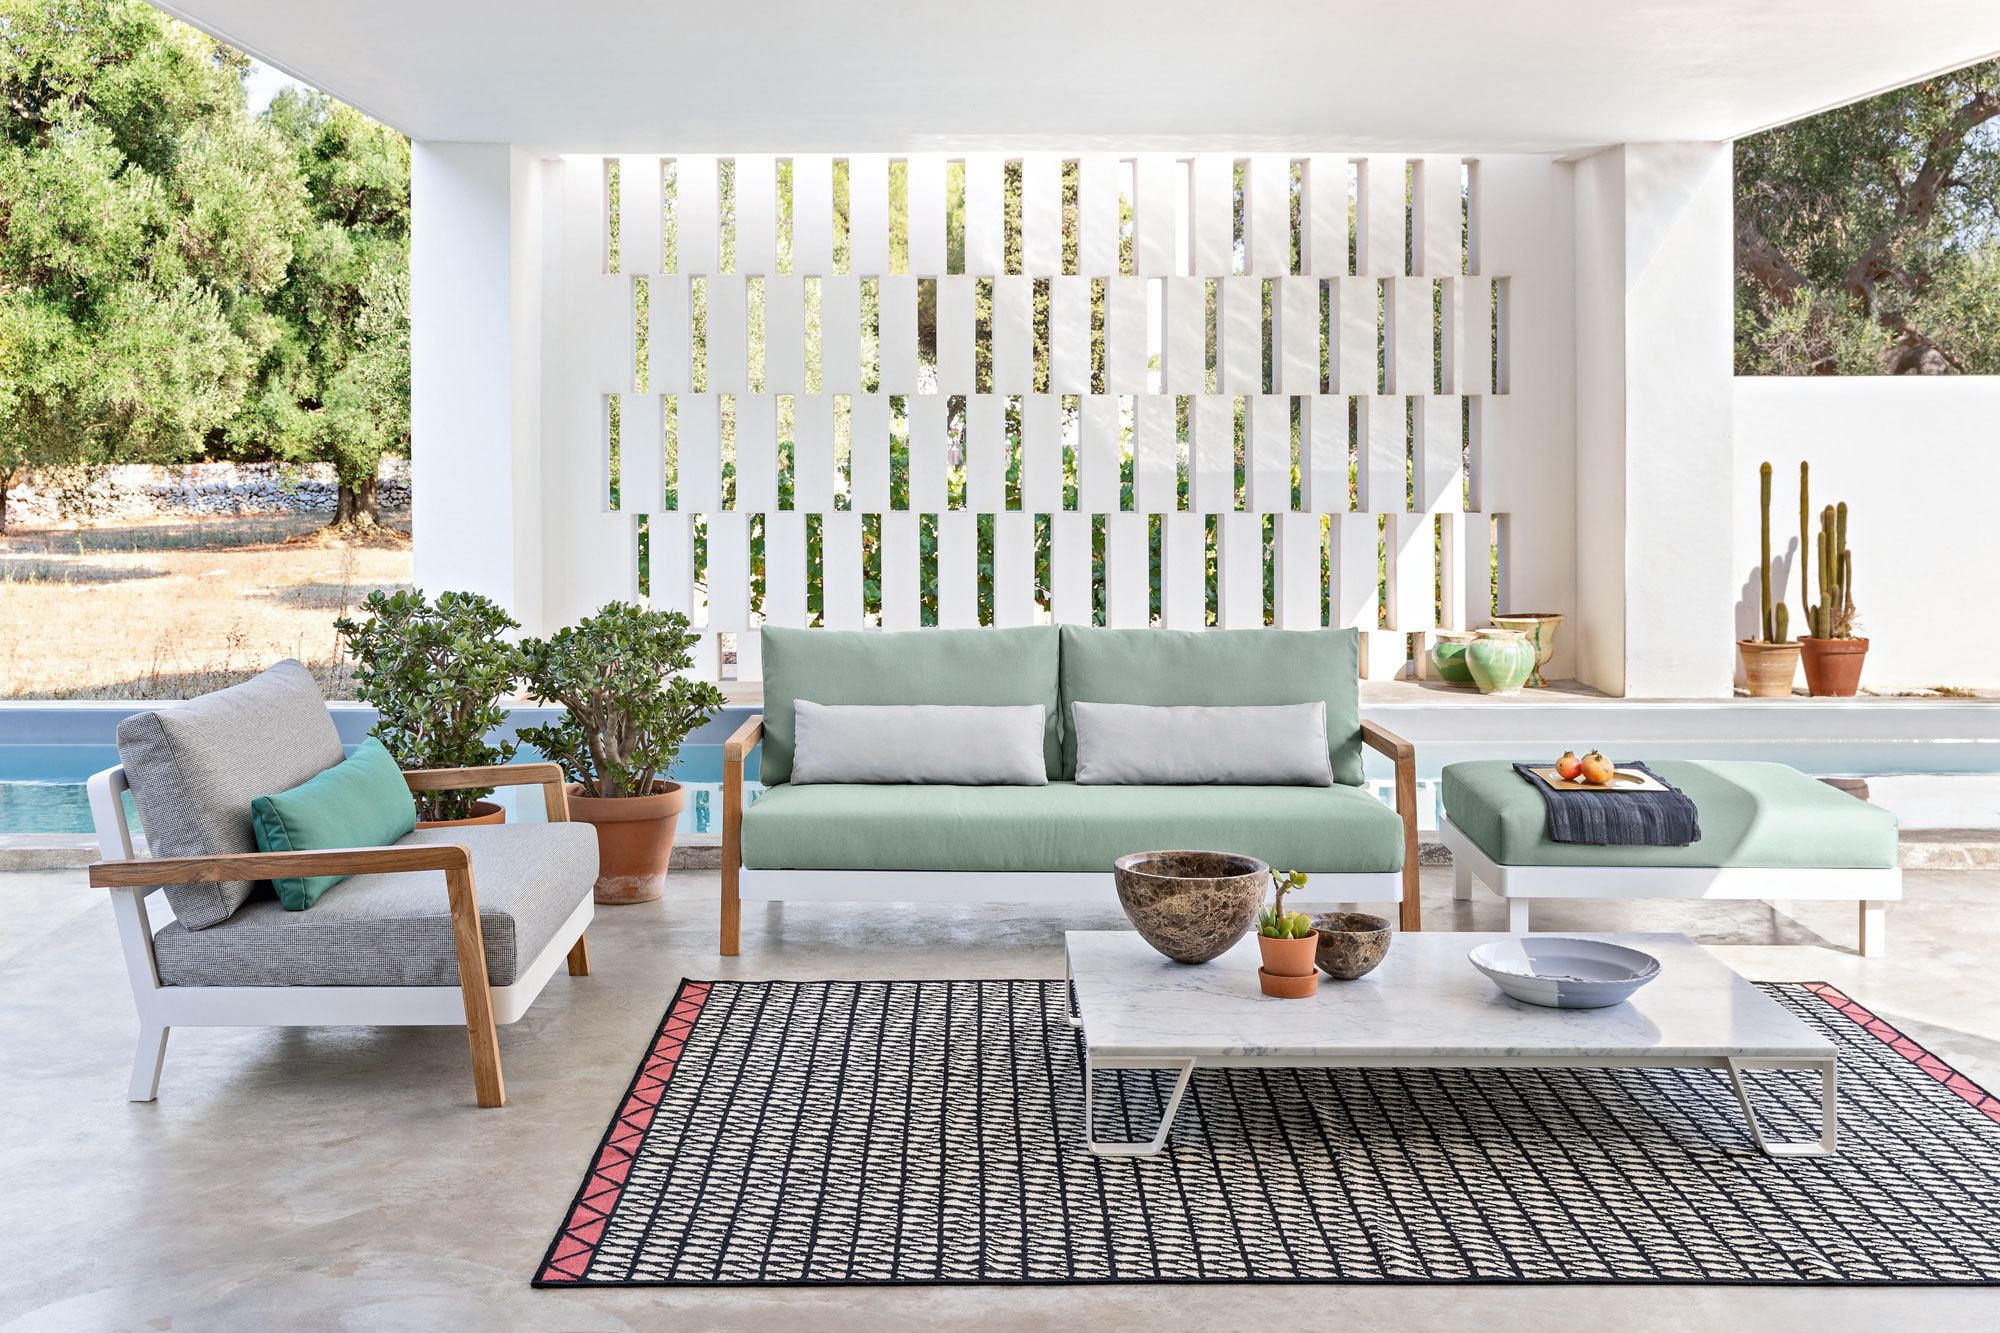 Outdoor-Möbel & Outdoor-KüchenPaola Navone, Sofa Win, Gervasoni. Foto/ Copyright: Gervasoni